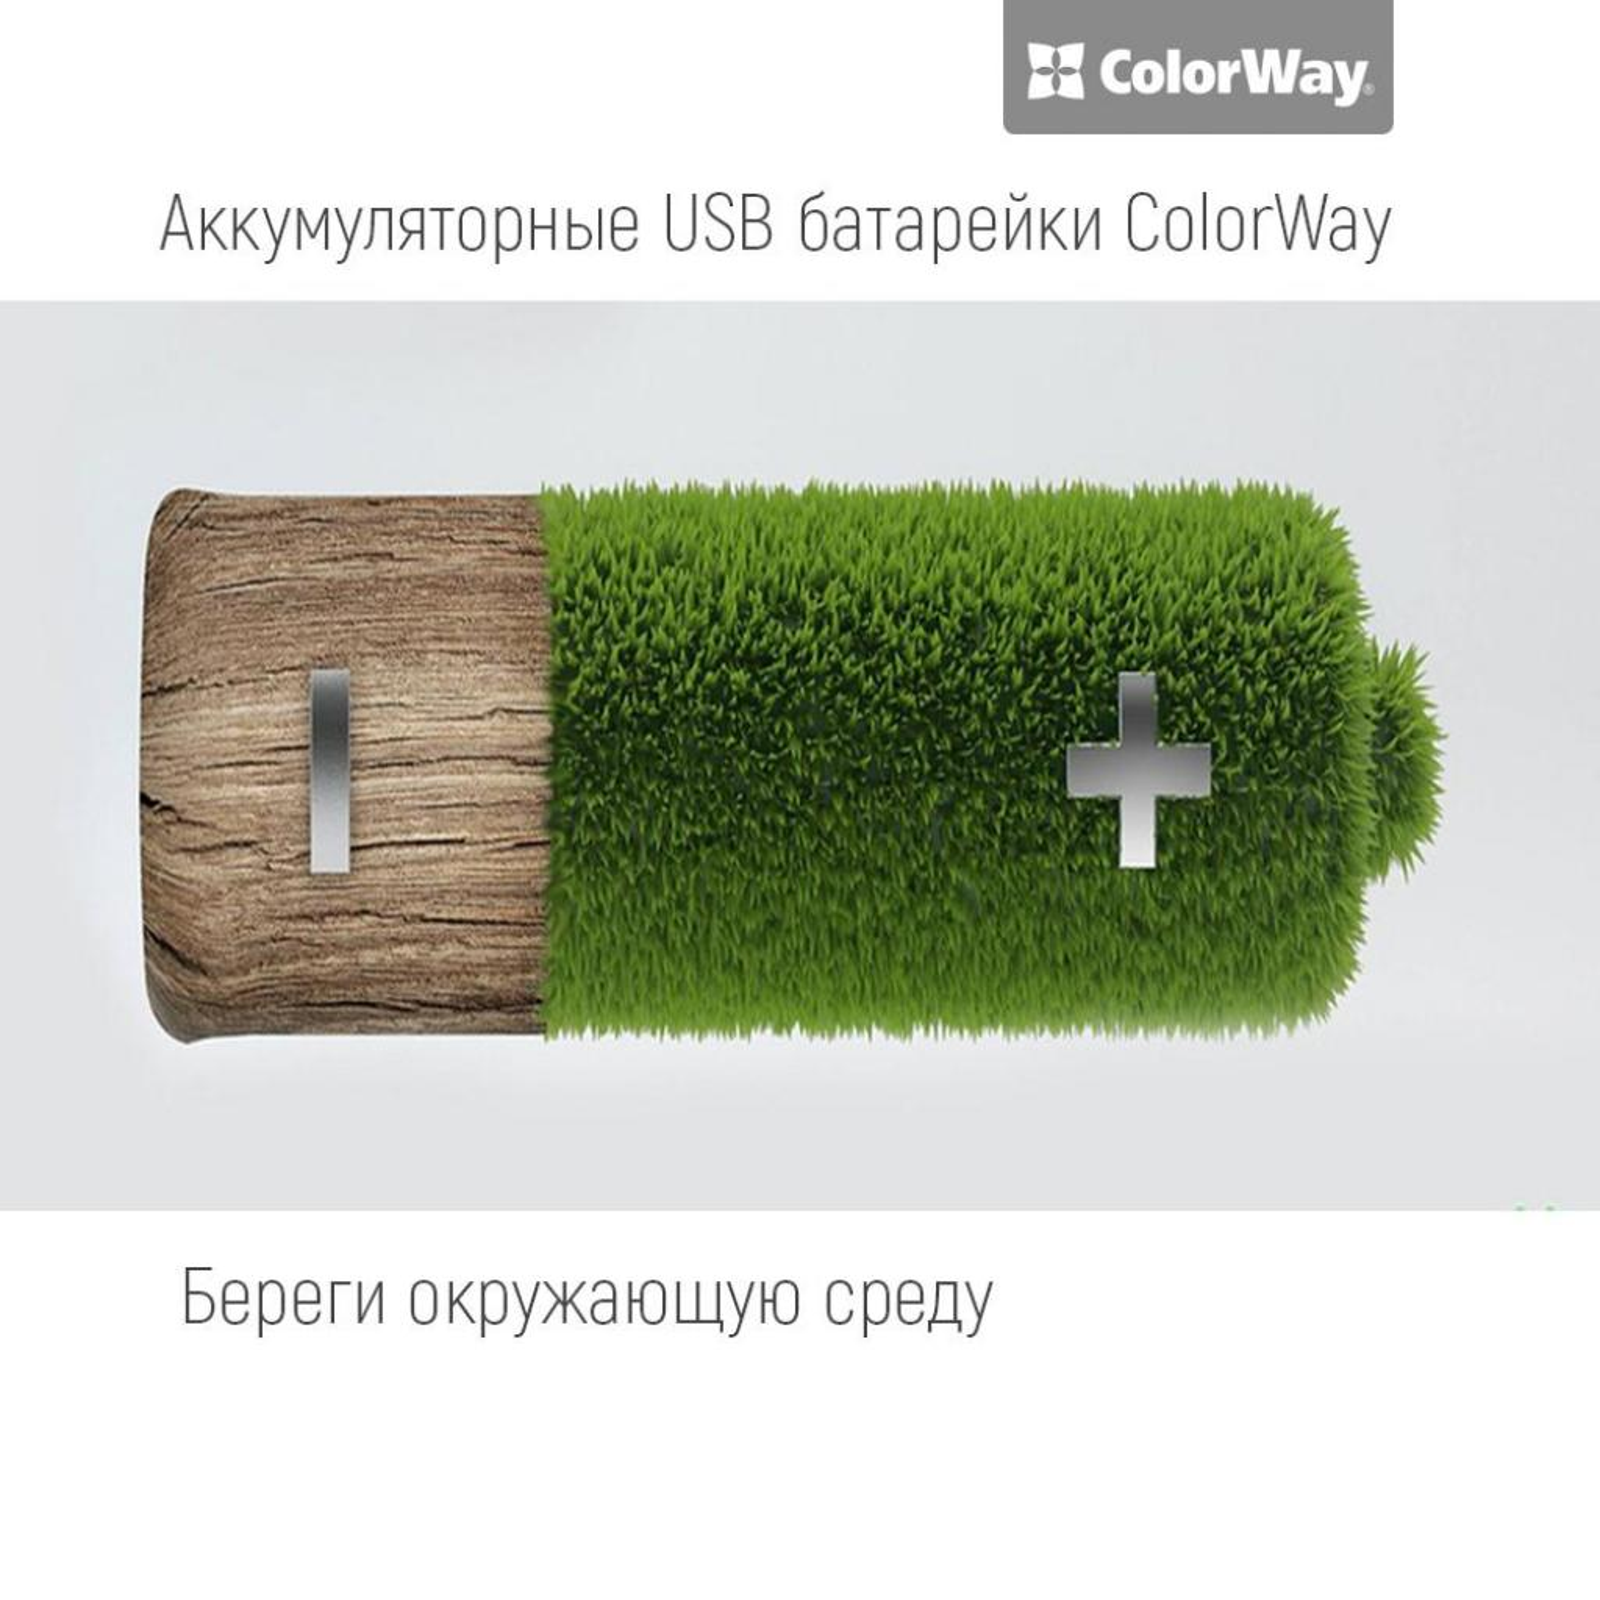 Аккумулятор ColorWay AAA micro USB 400 mAh * 2 (CW-UBAAA-01) изображение 3